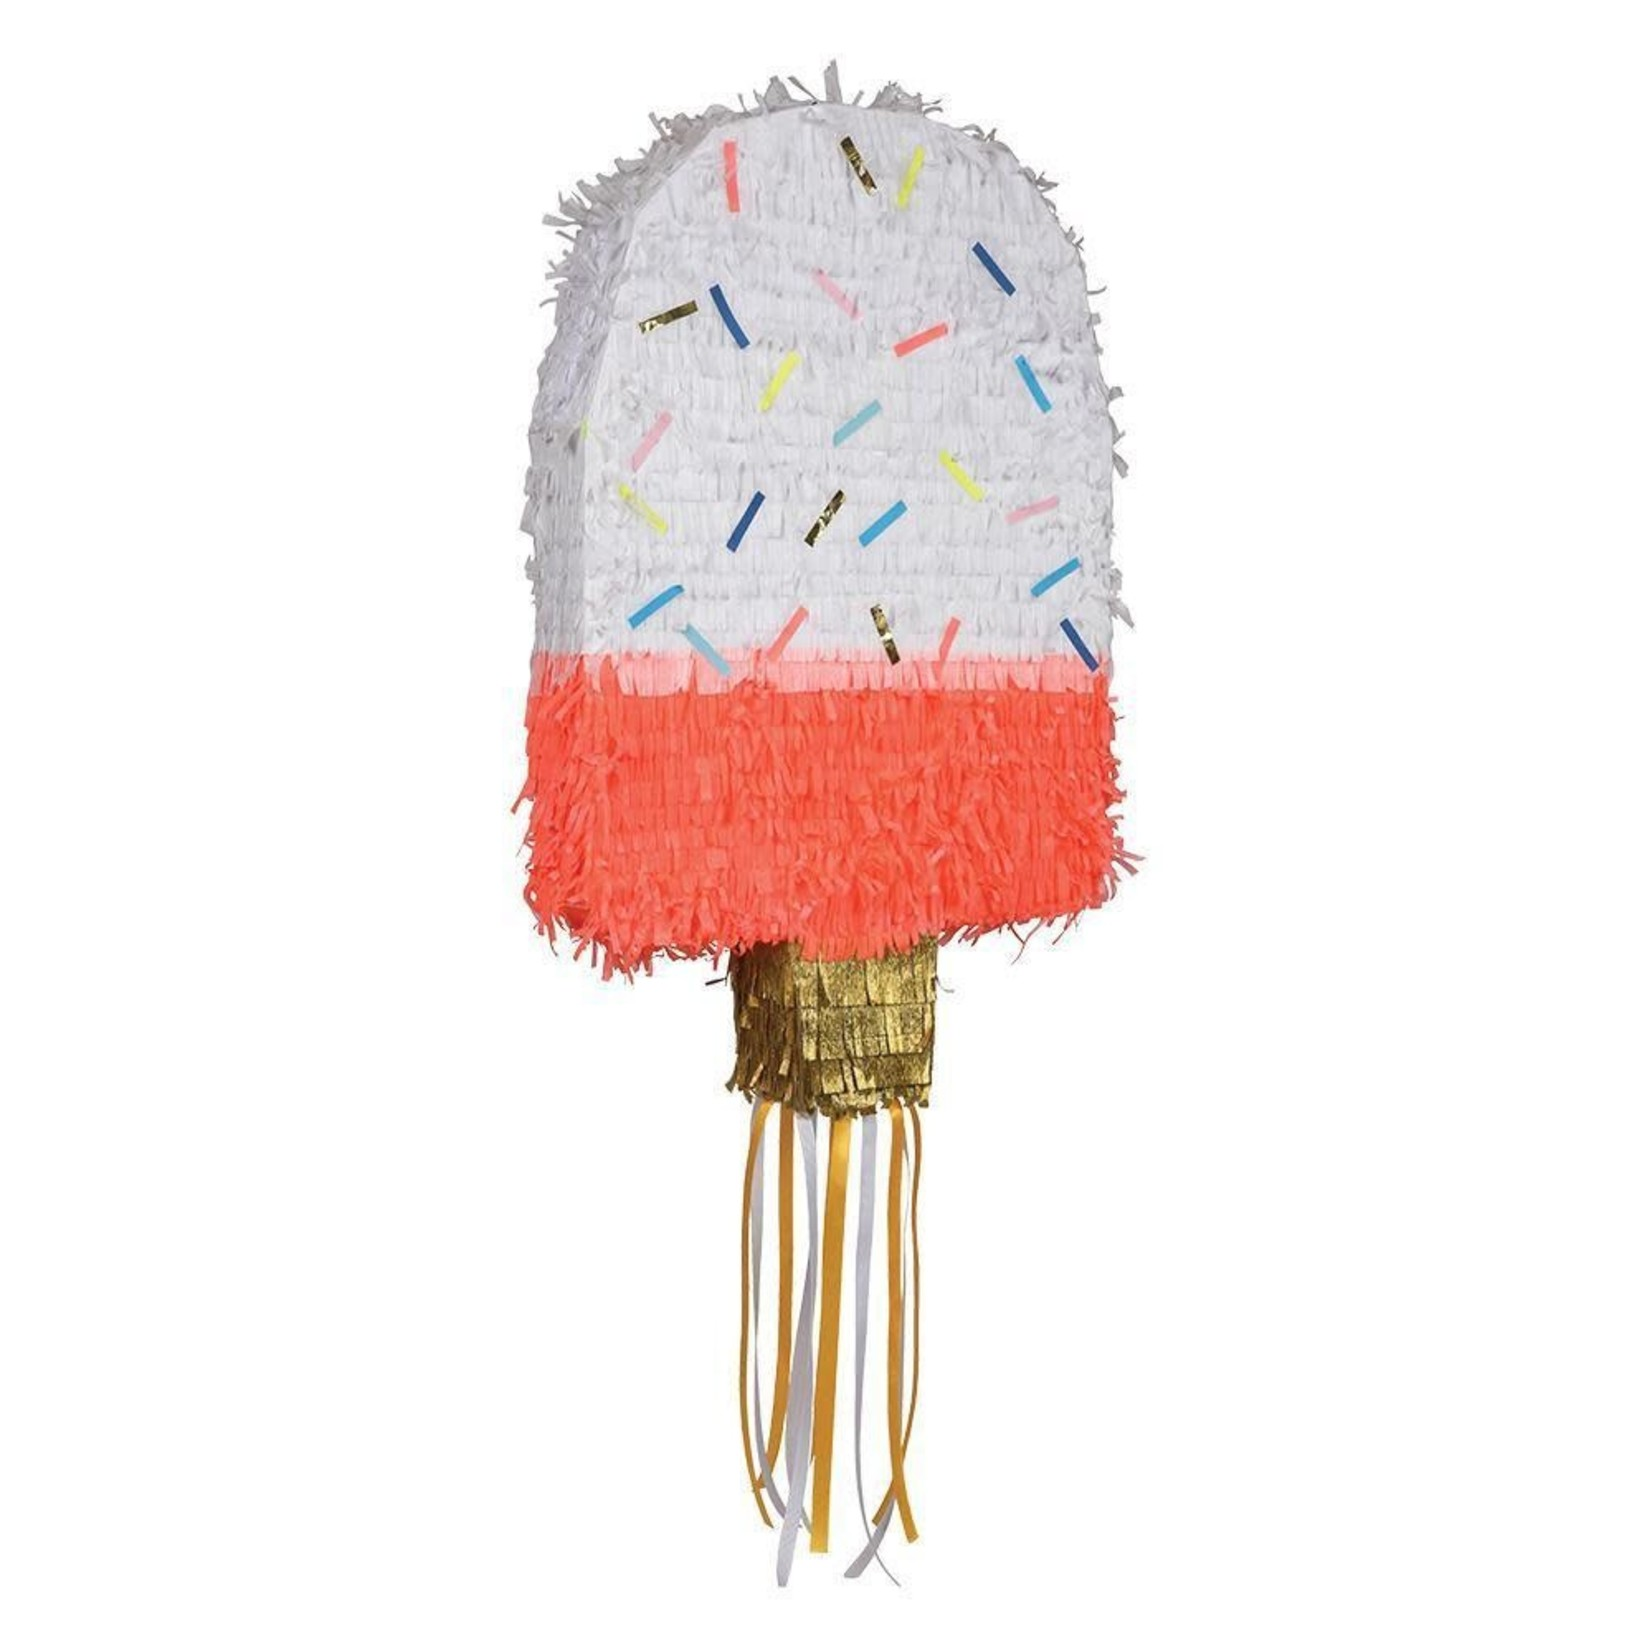 Meri meri Meri meri - Piñata